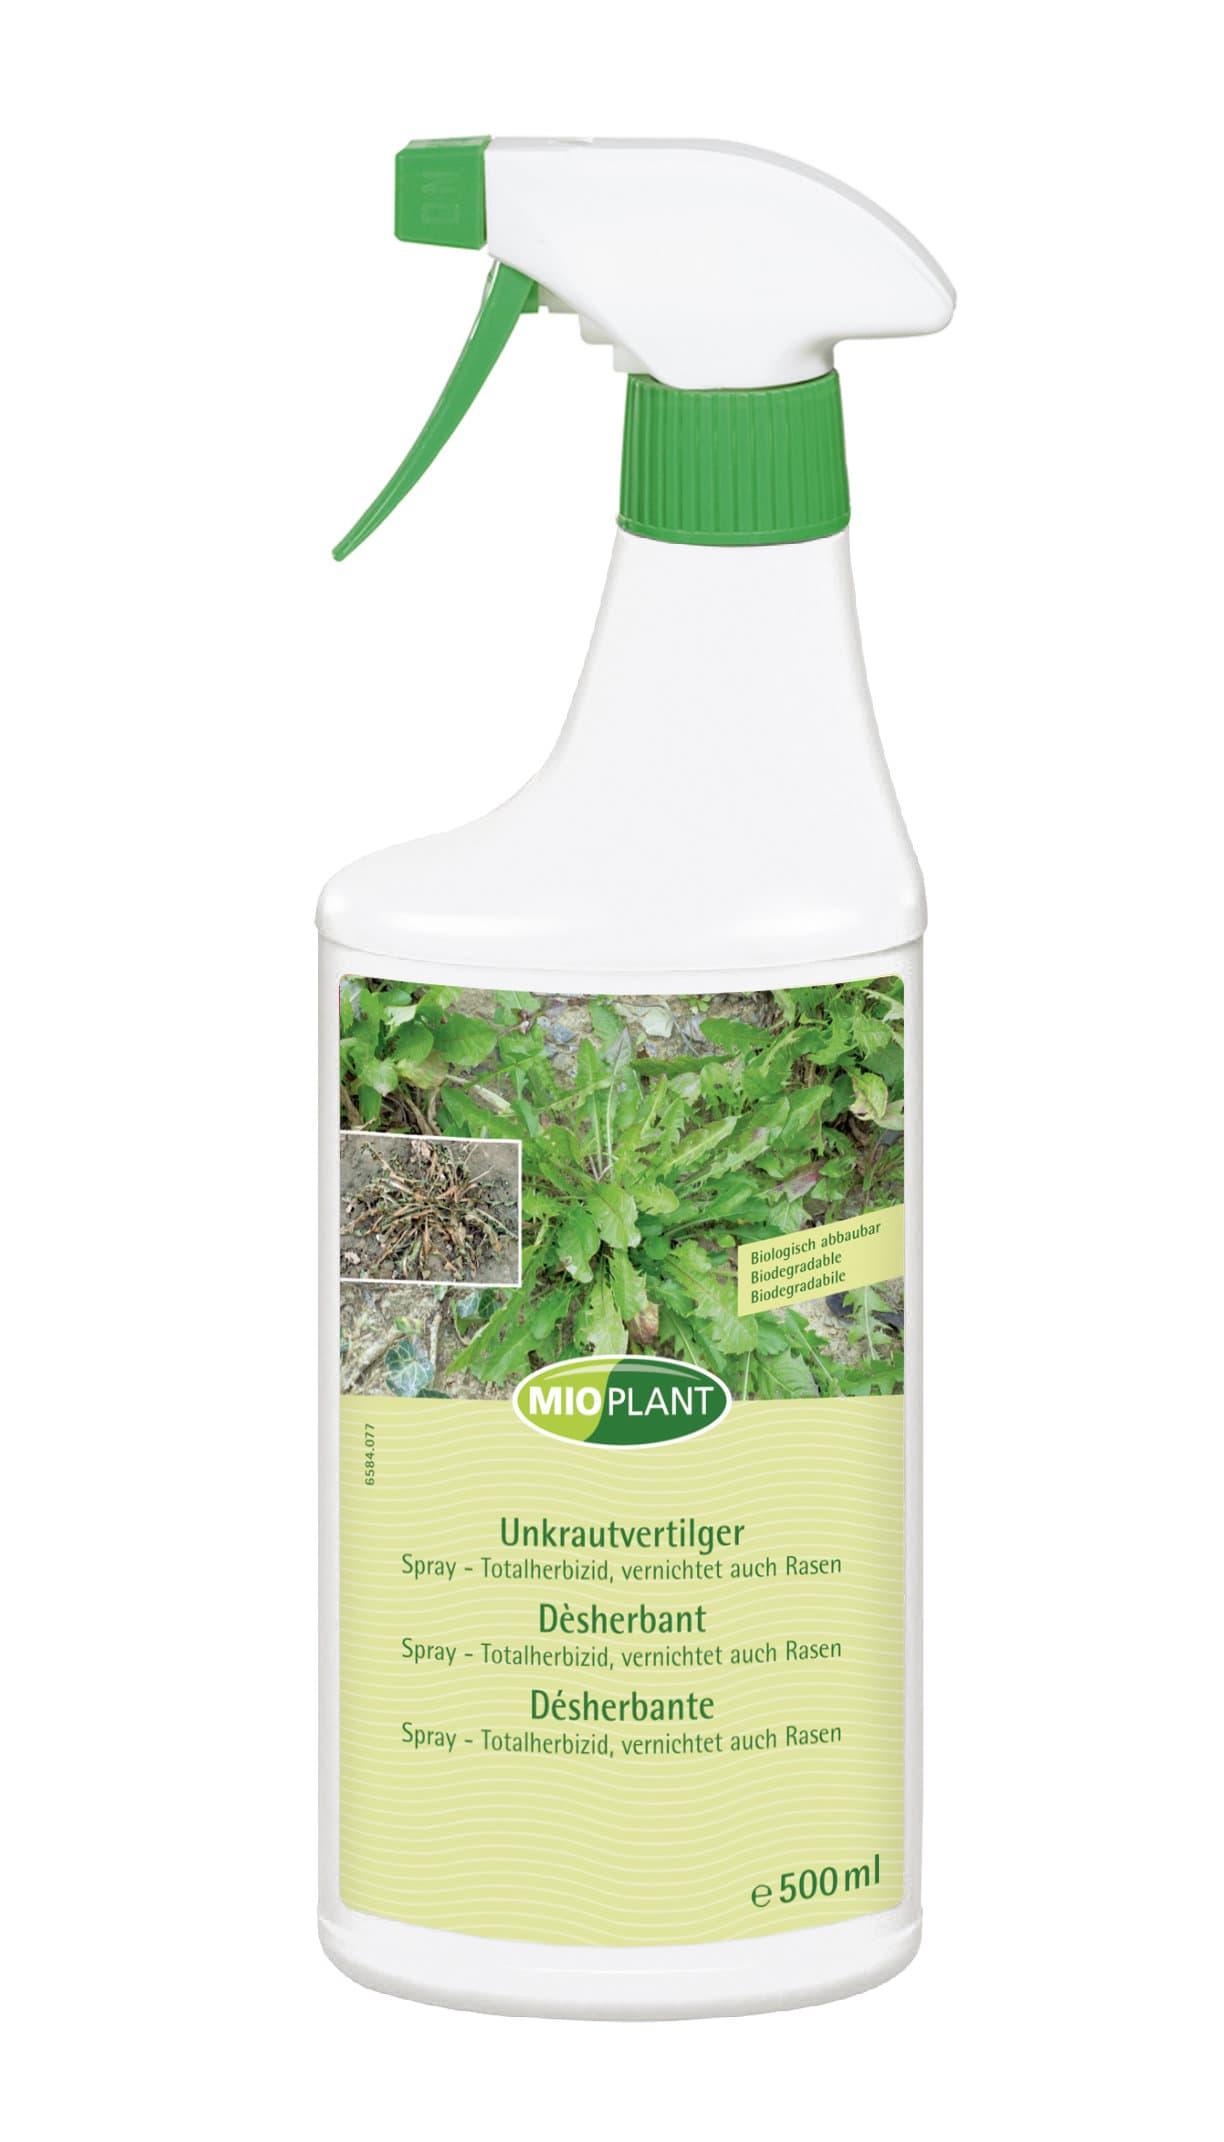 Mioplant Désherbant prêt à l'emploi, 500 ml